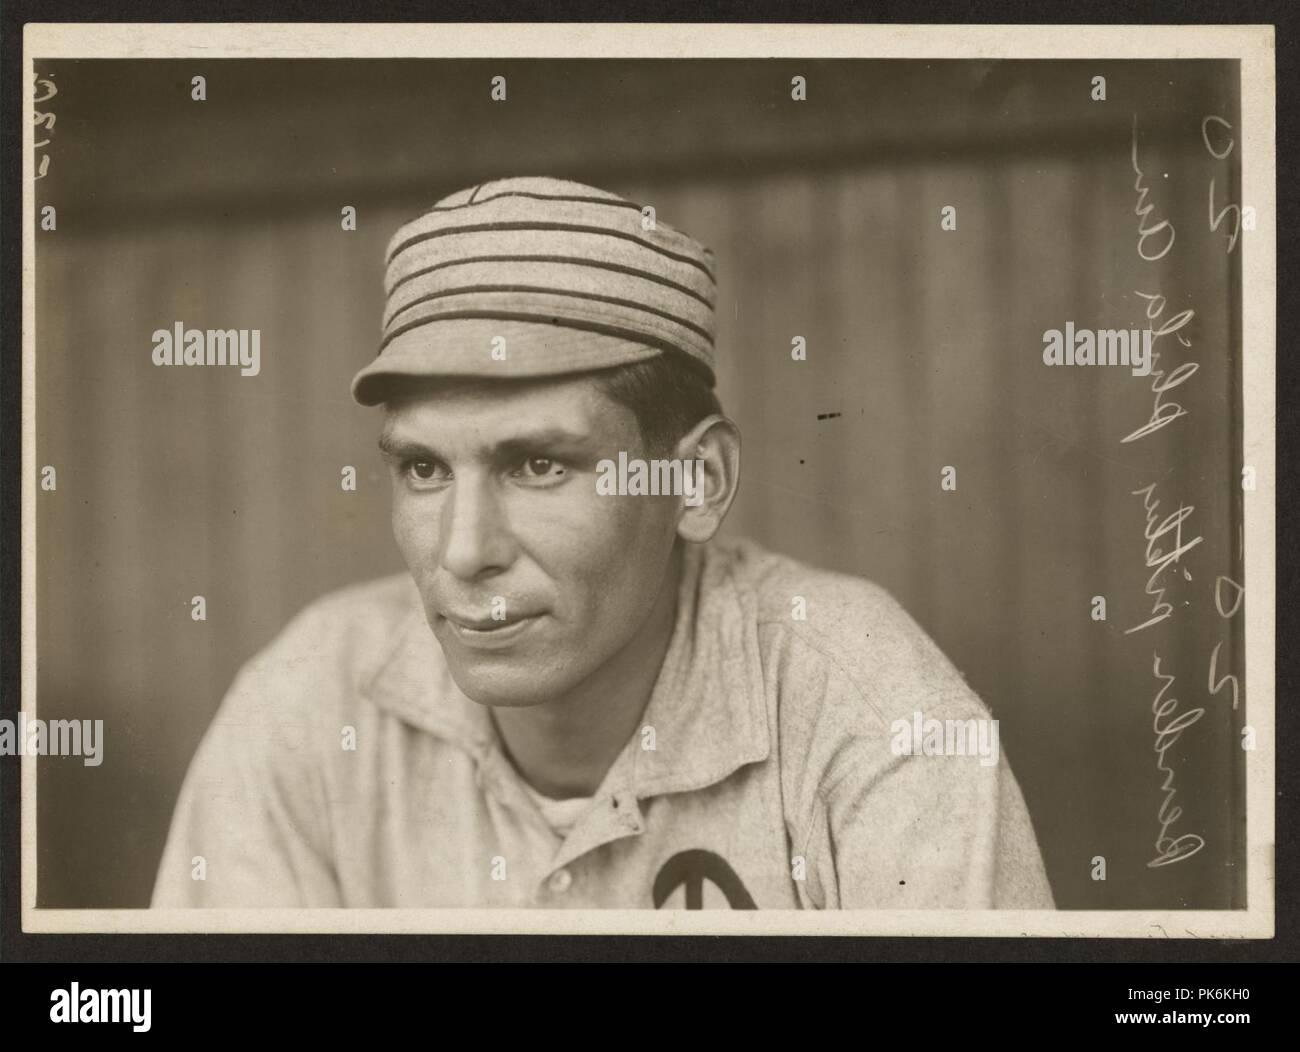 Bender, Phila. Am. - Stock Image